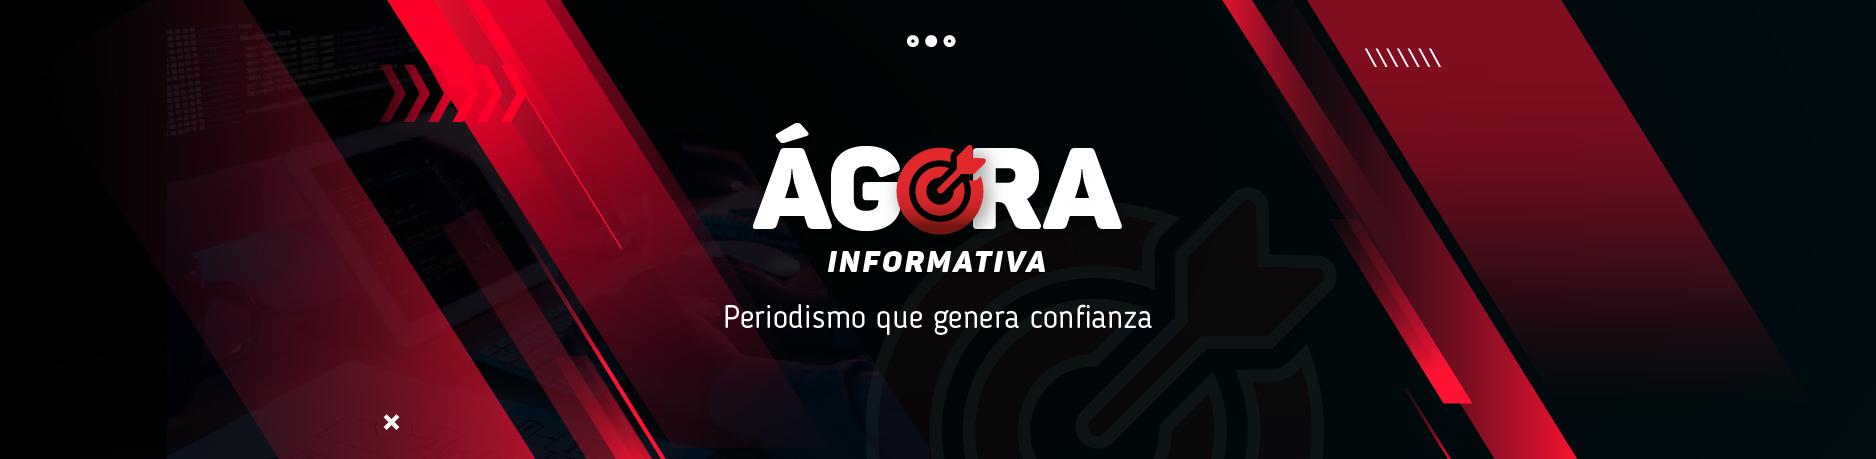 Agora Informativa